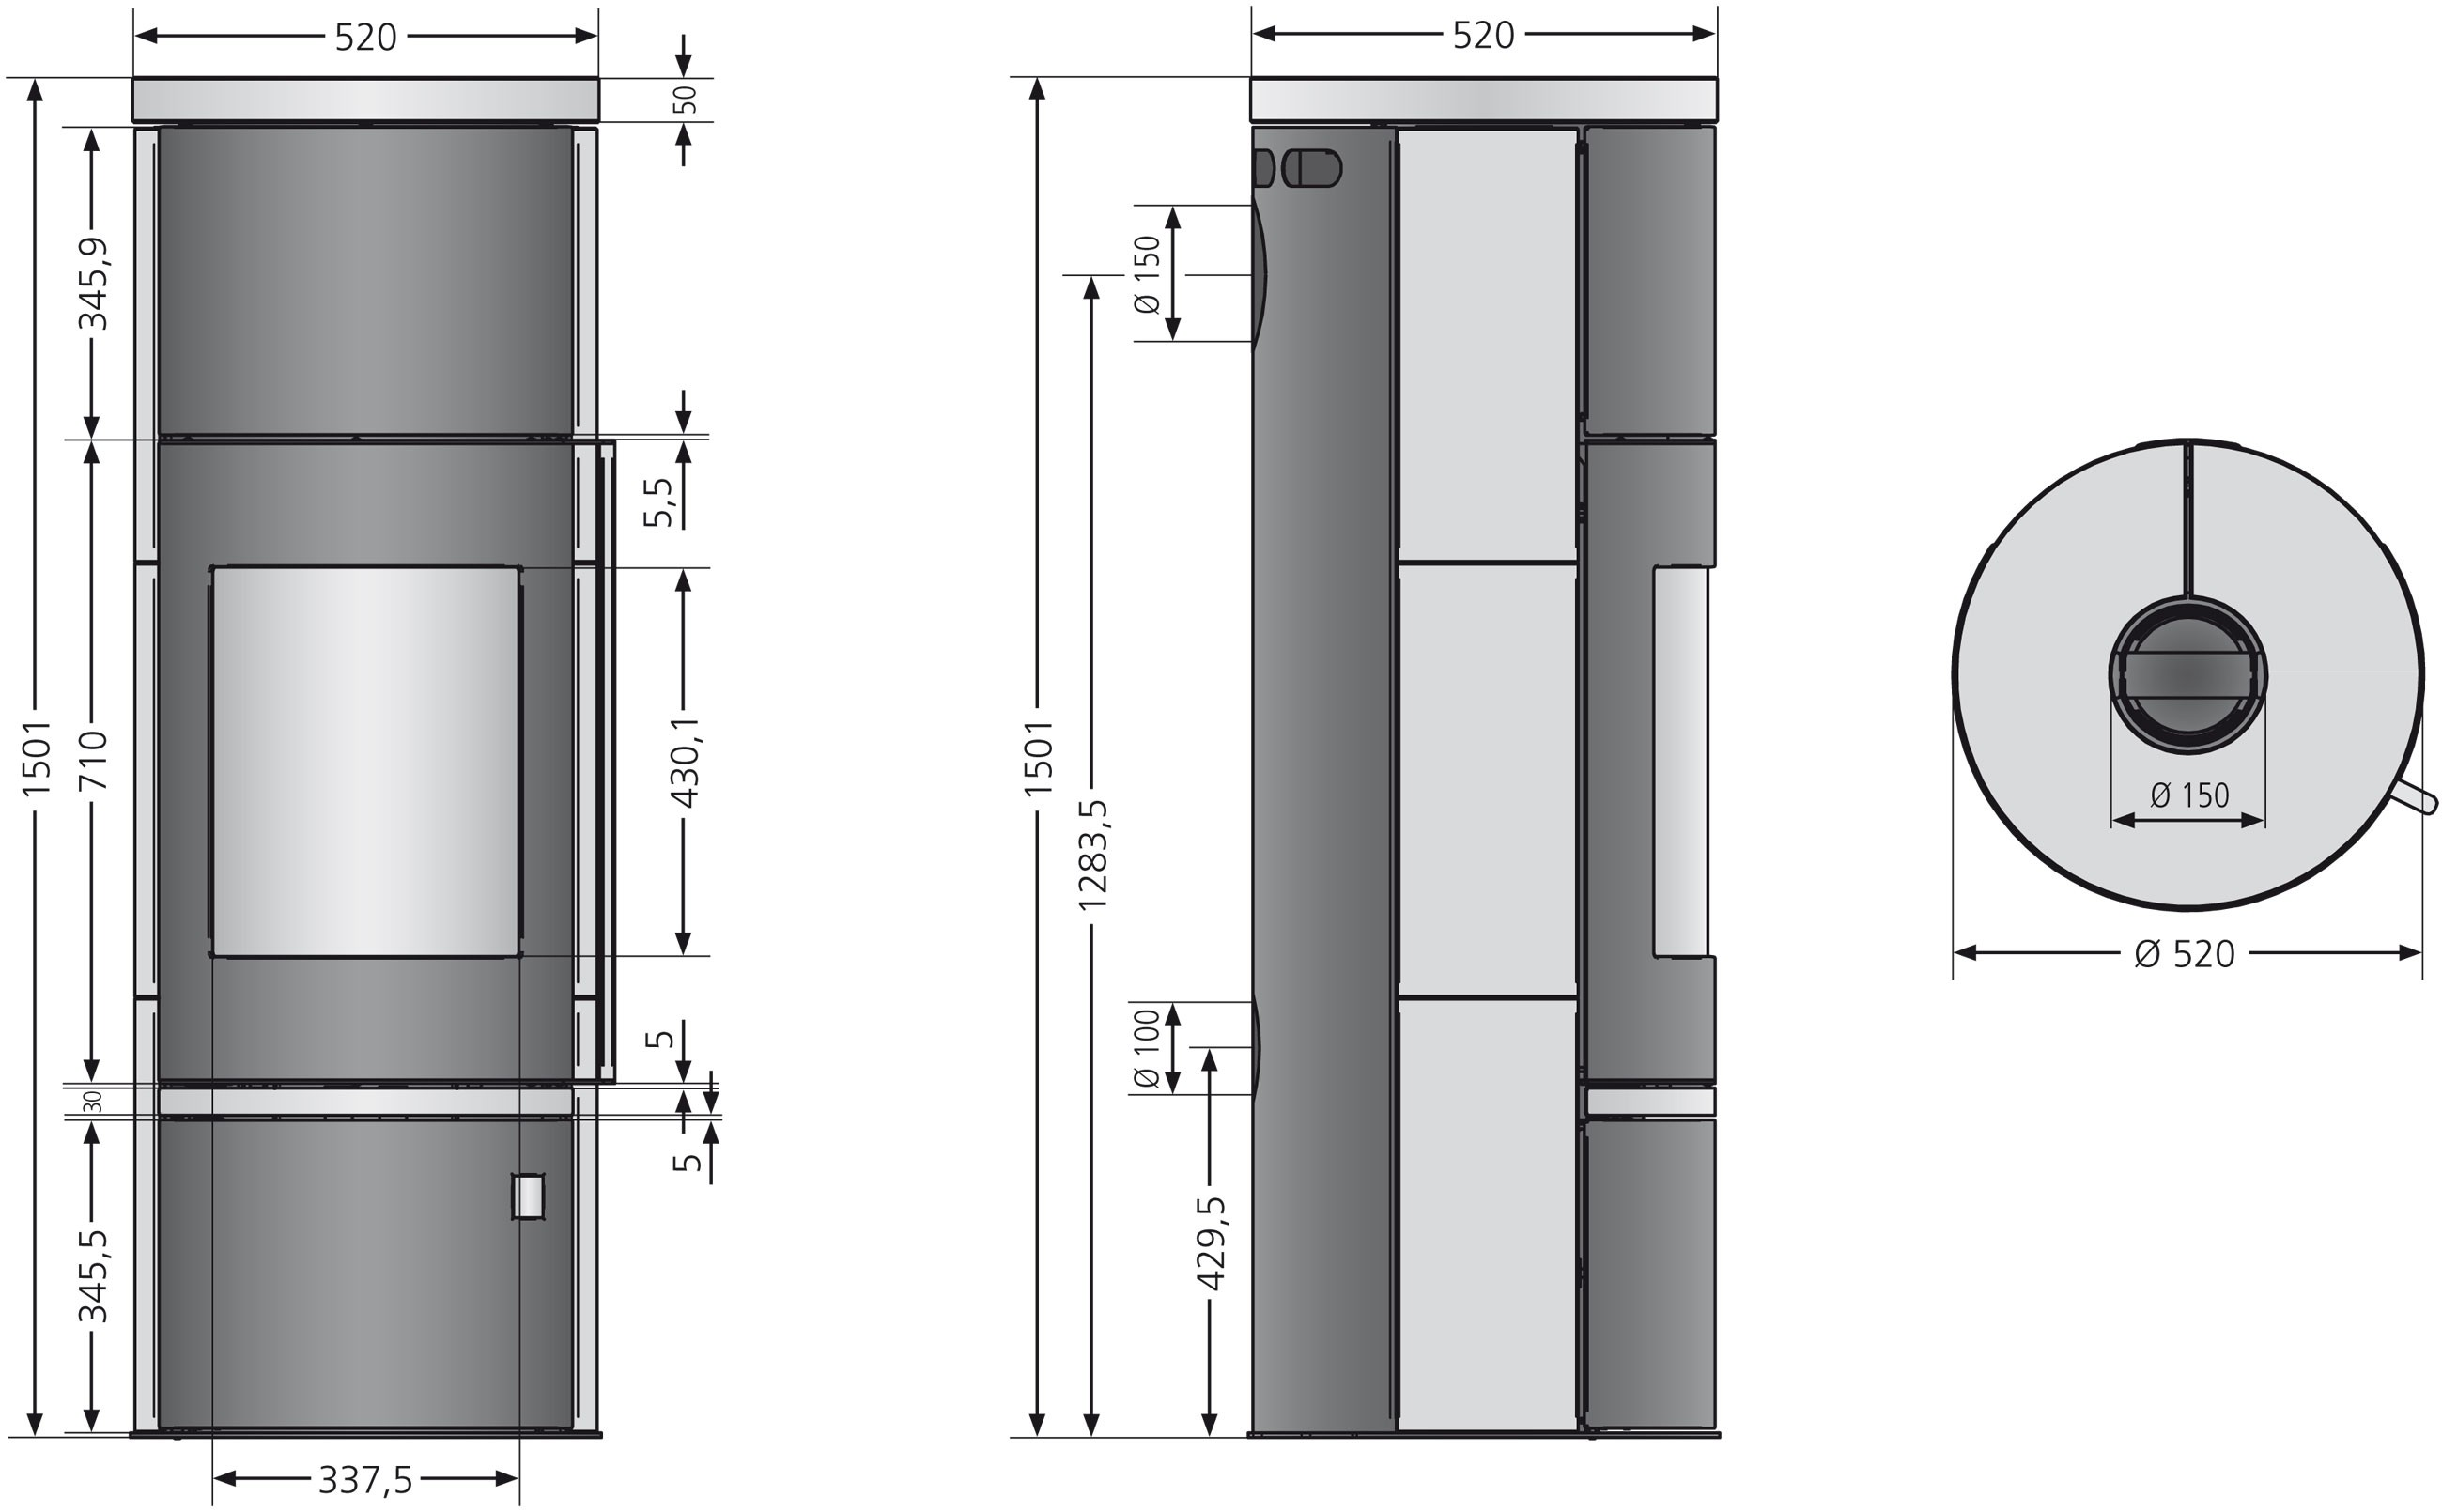 Kaminofen Justus Faro W+ 2.0 raumluftunabhängig Stahl schwarz 7kW Bild 3